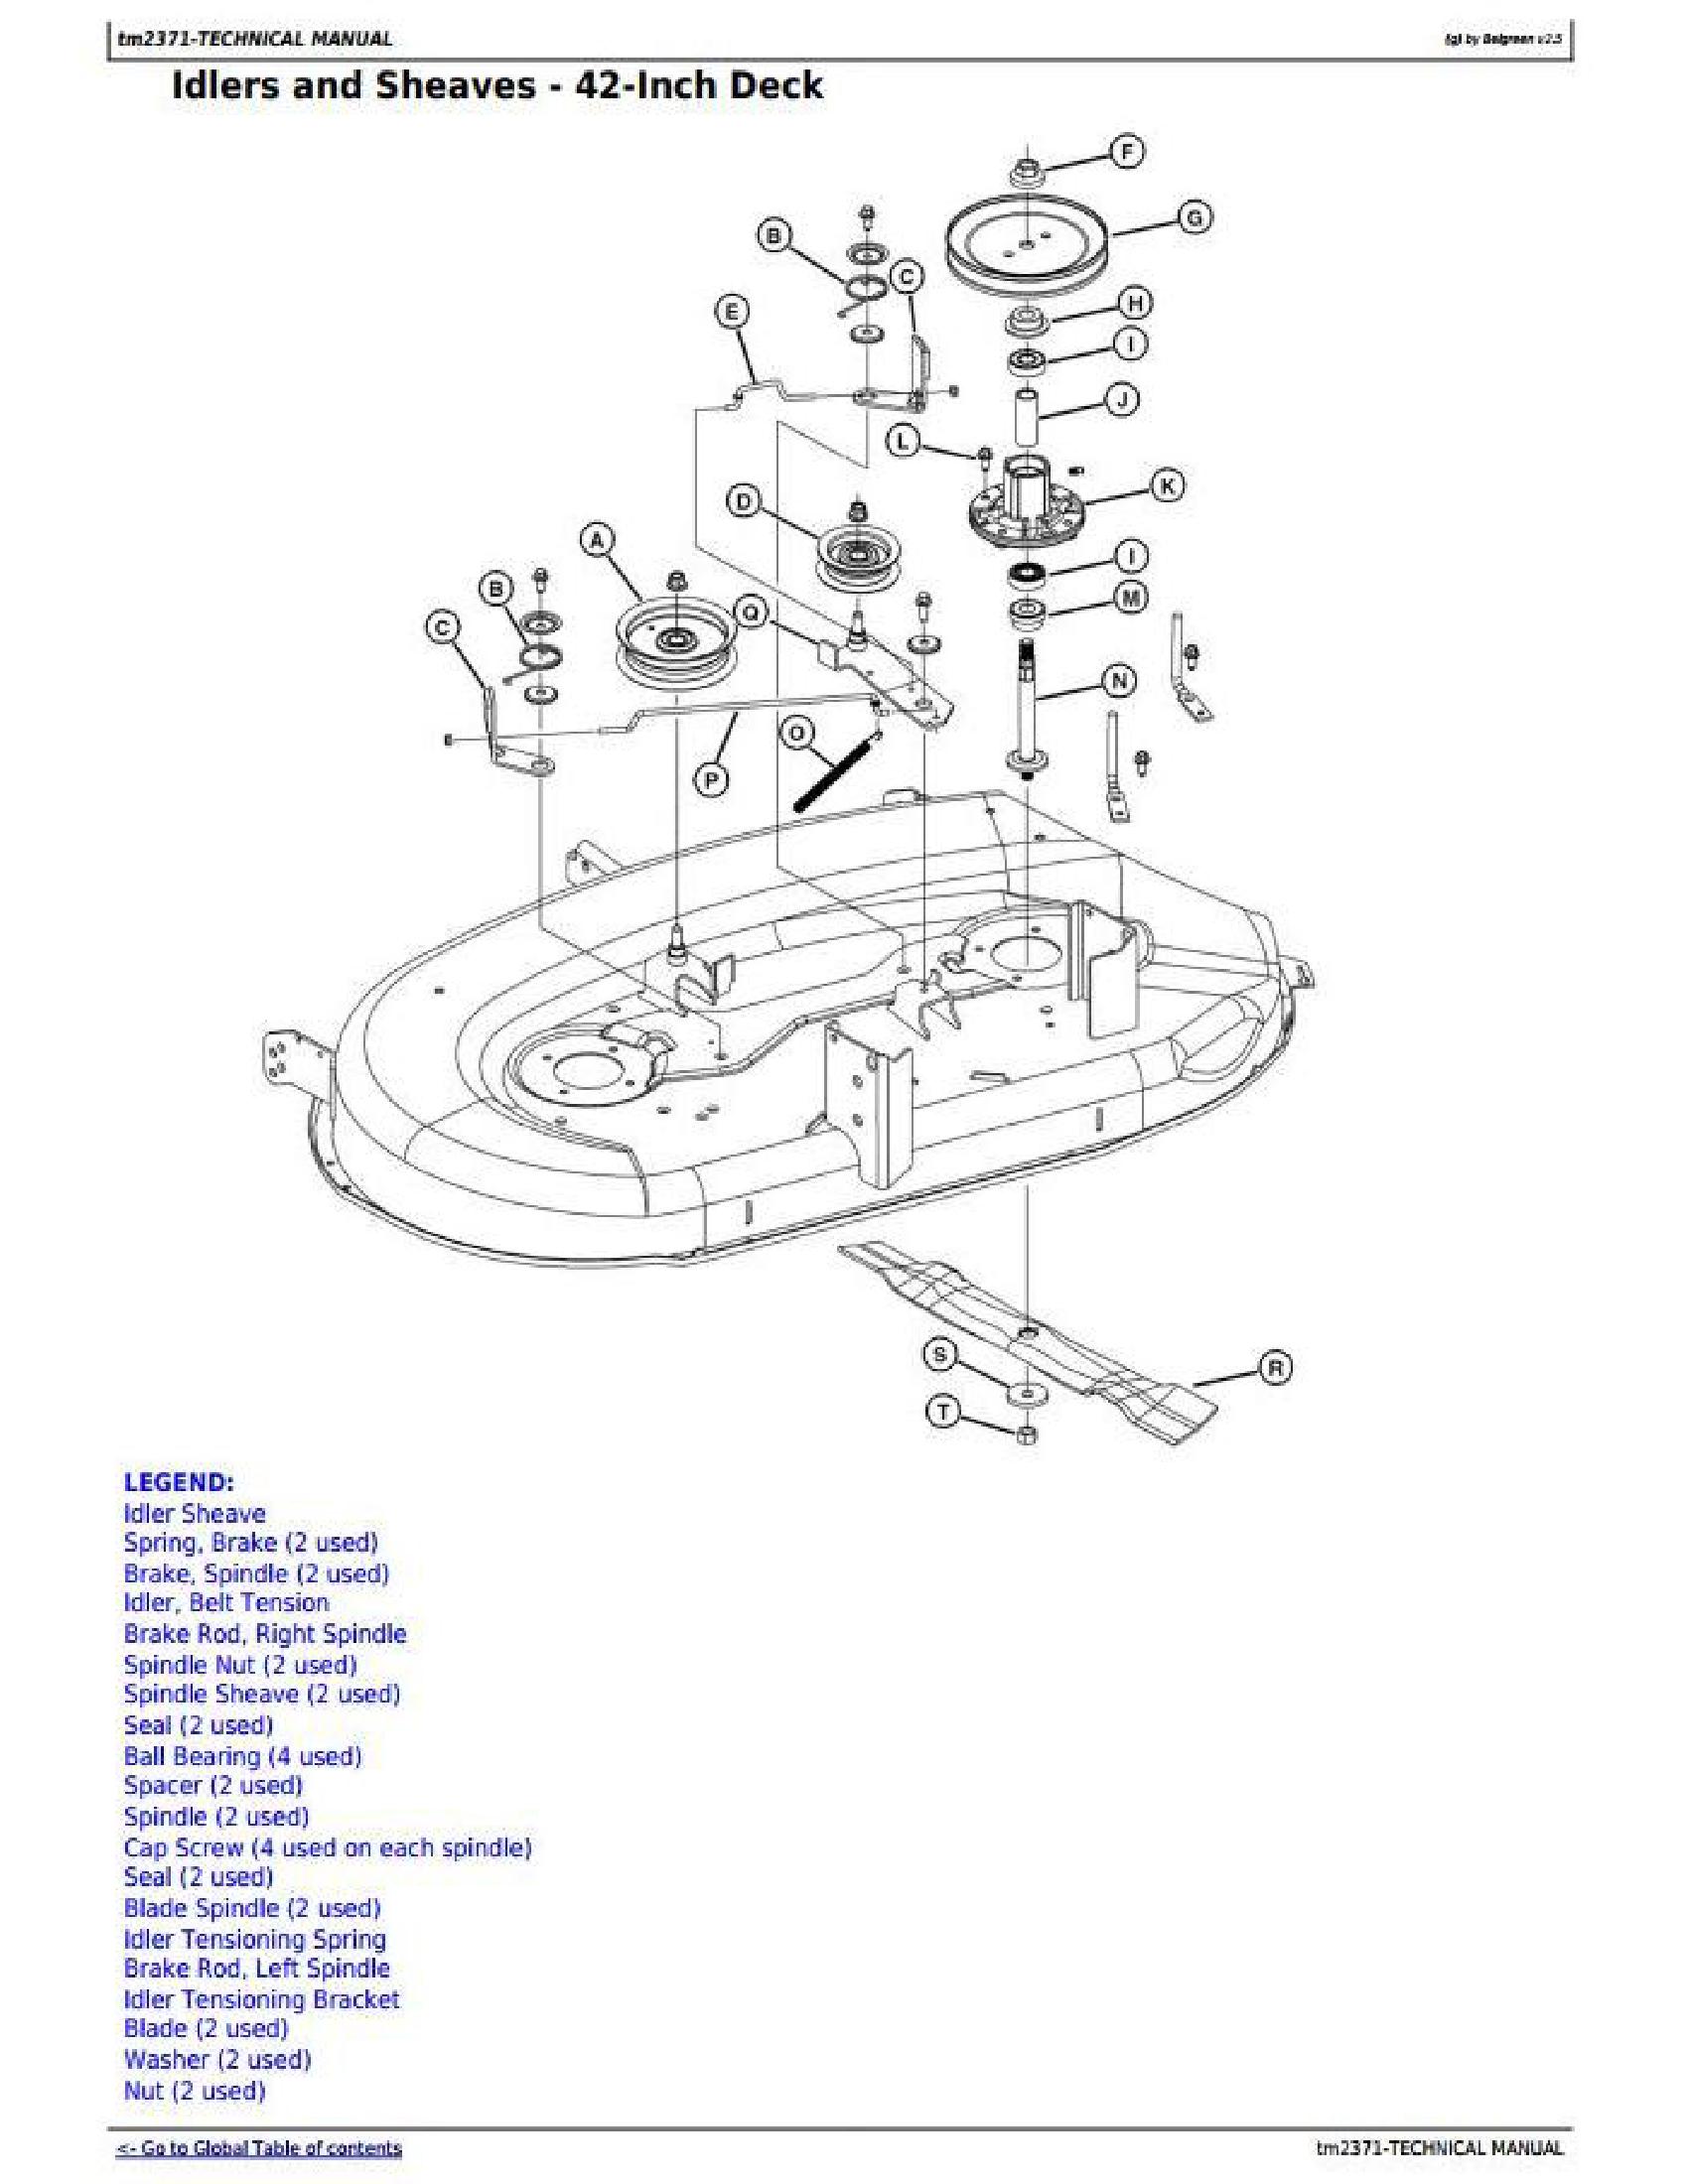 John Deere LA150 manual